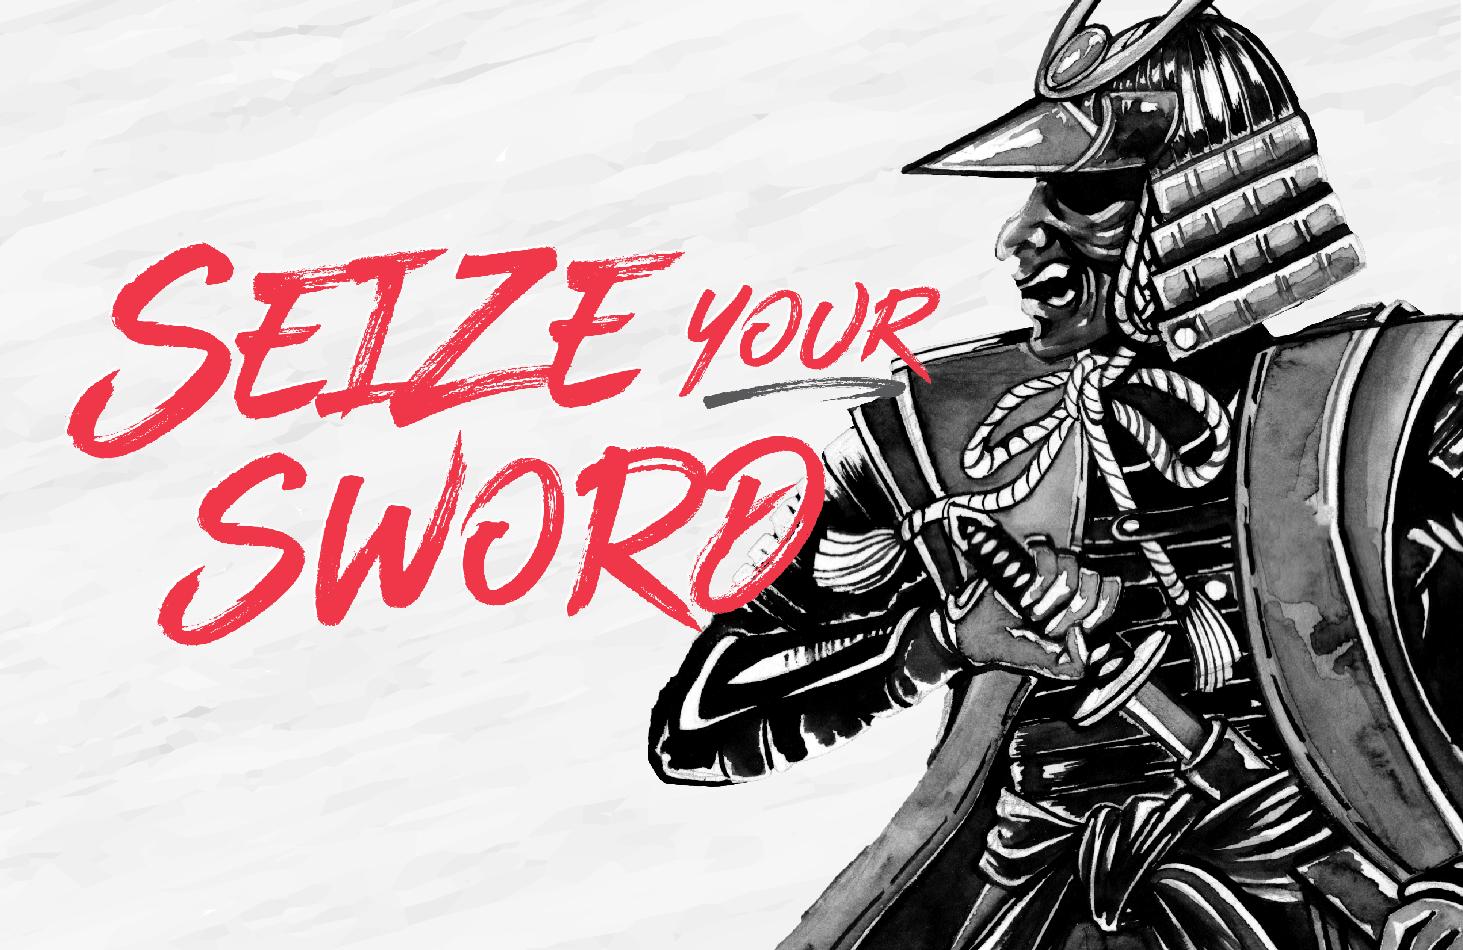 KickstarterPanels_Seize Your Sword.jpg